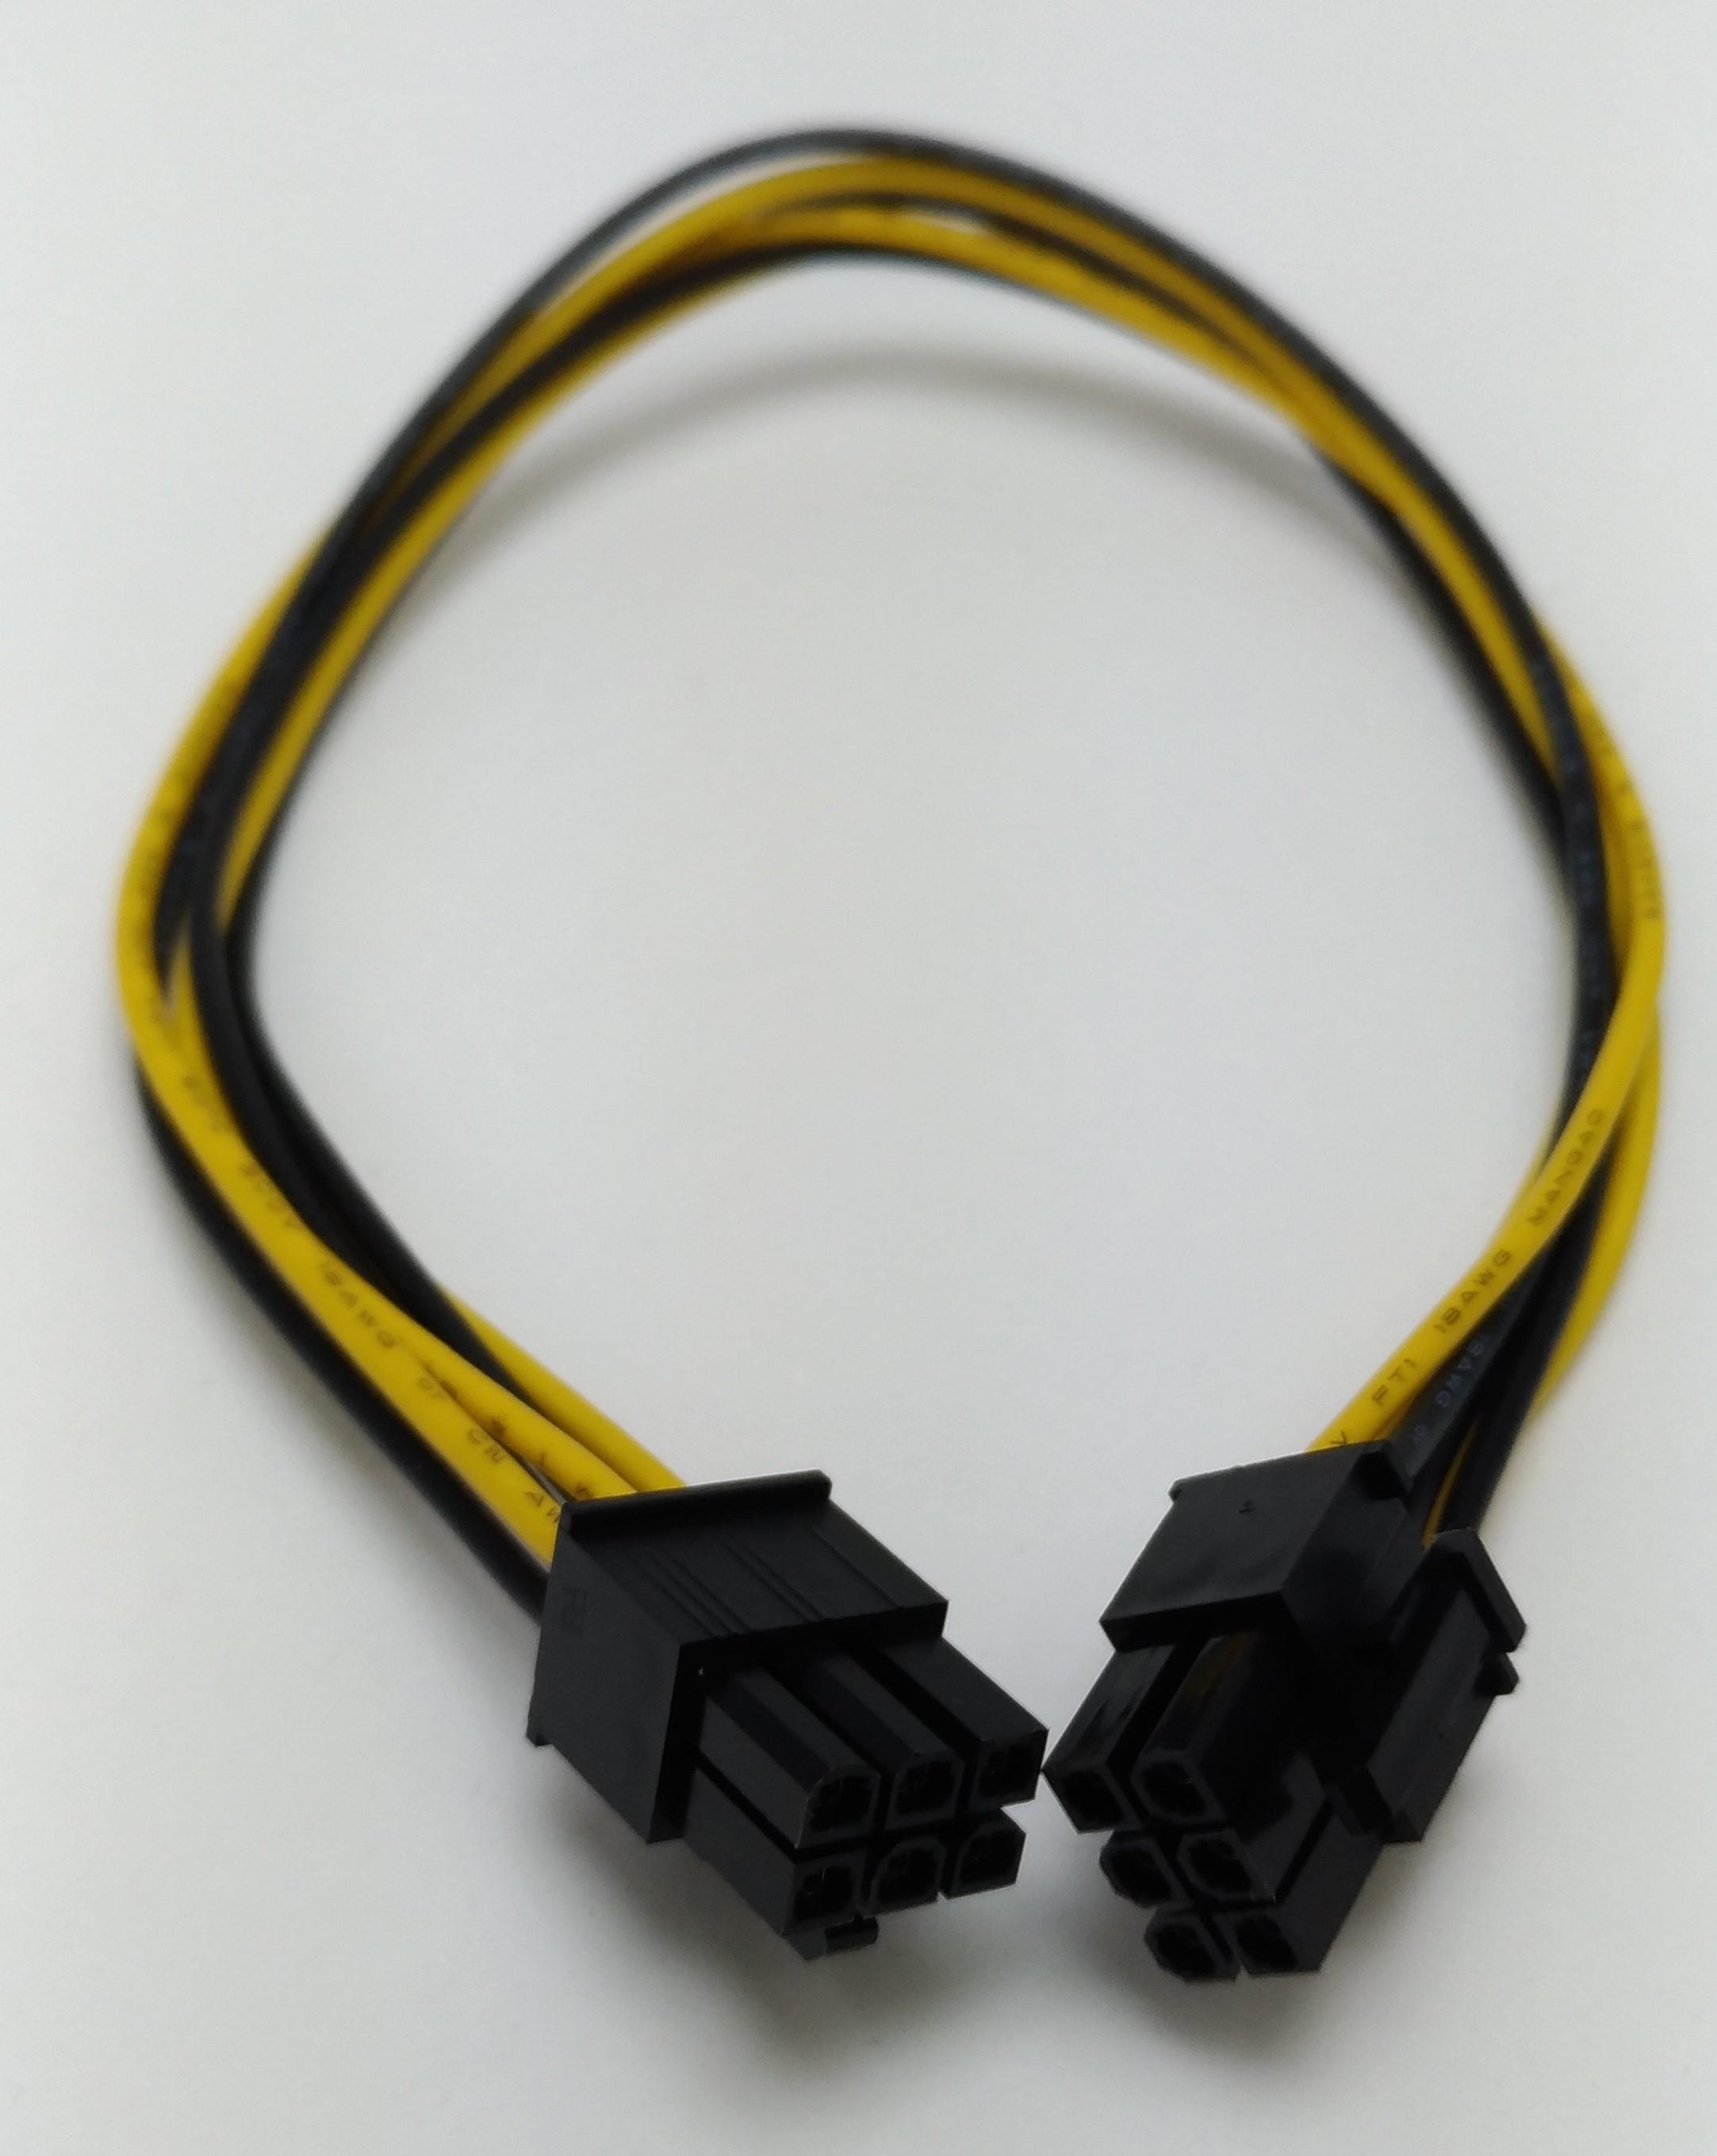 6pin-6pin male VGA用12V ケーブル